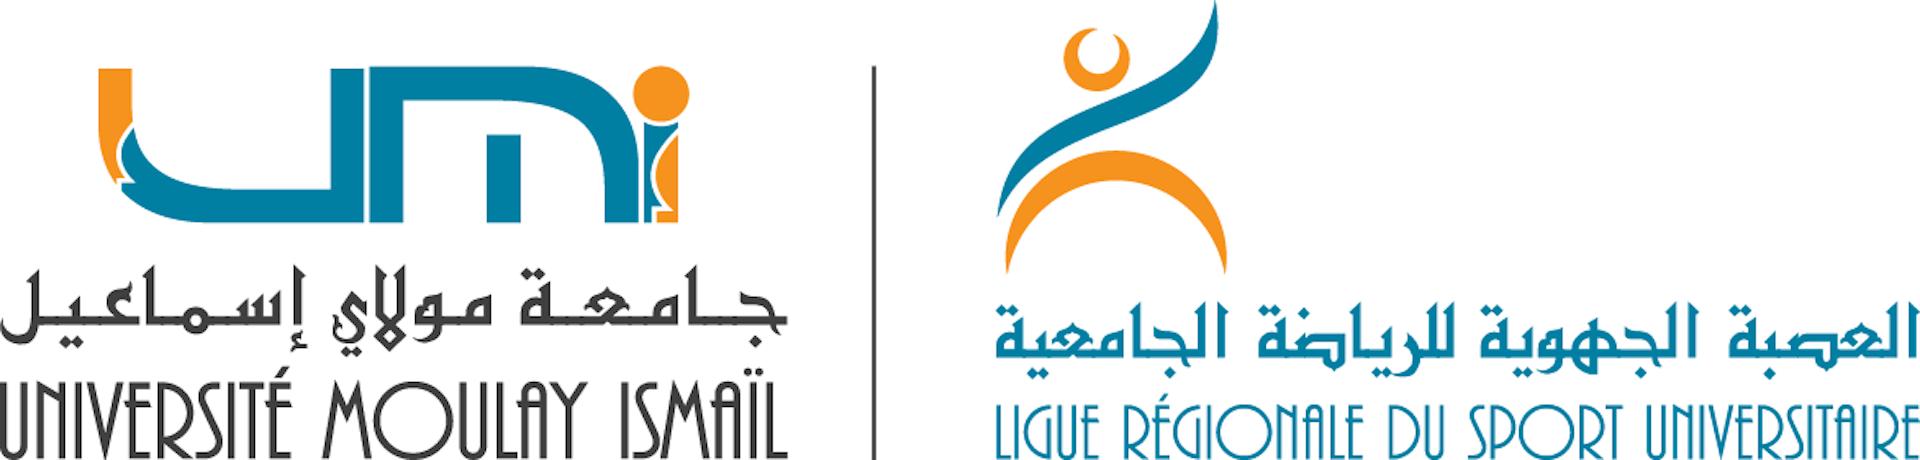 Logo 1476453064.png?ixlib=rb 1.1